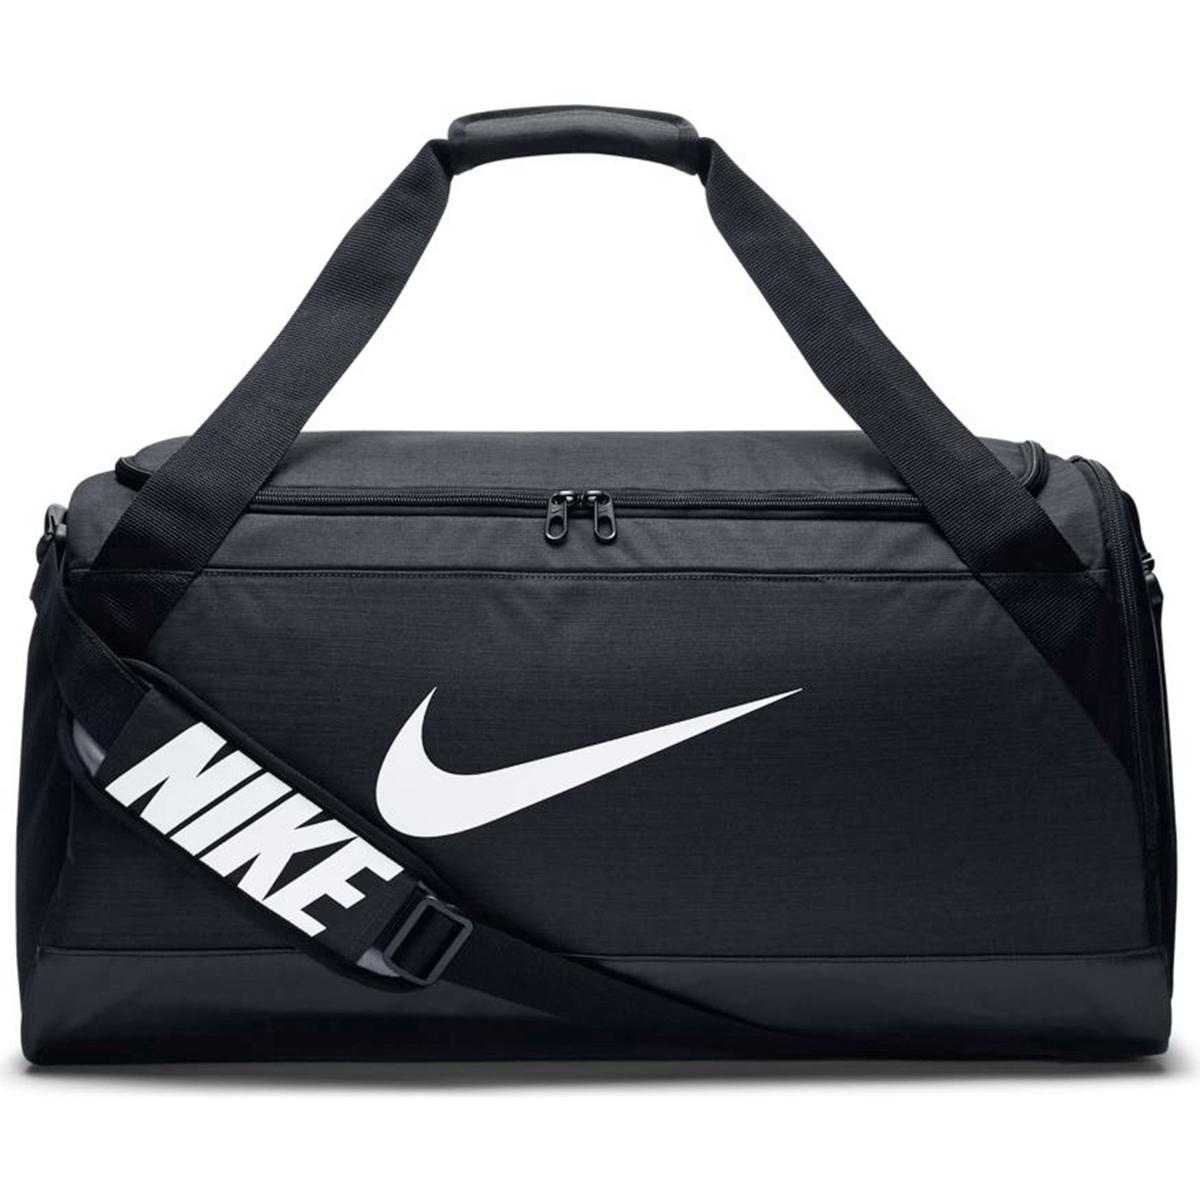 Mochila de deporte Brasilia (Medium) Training Duffel Bag